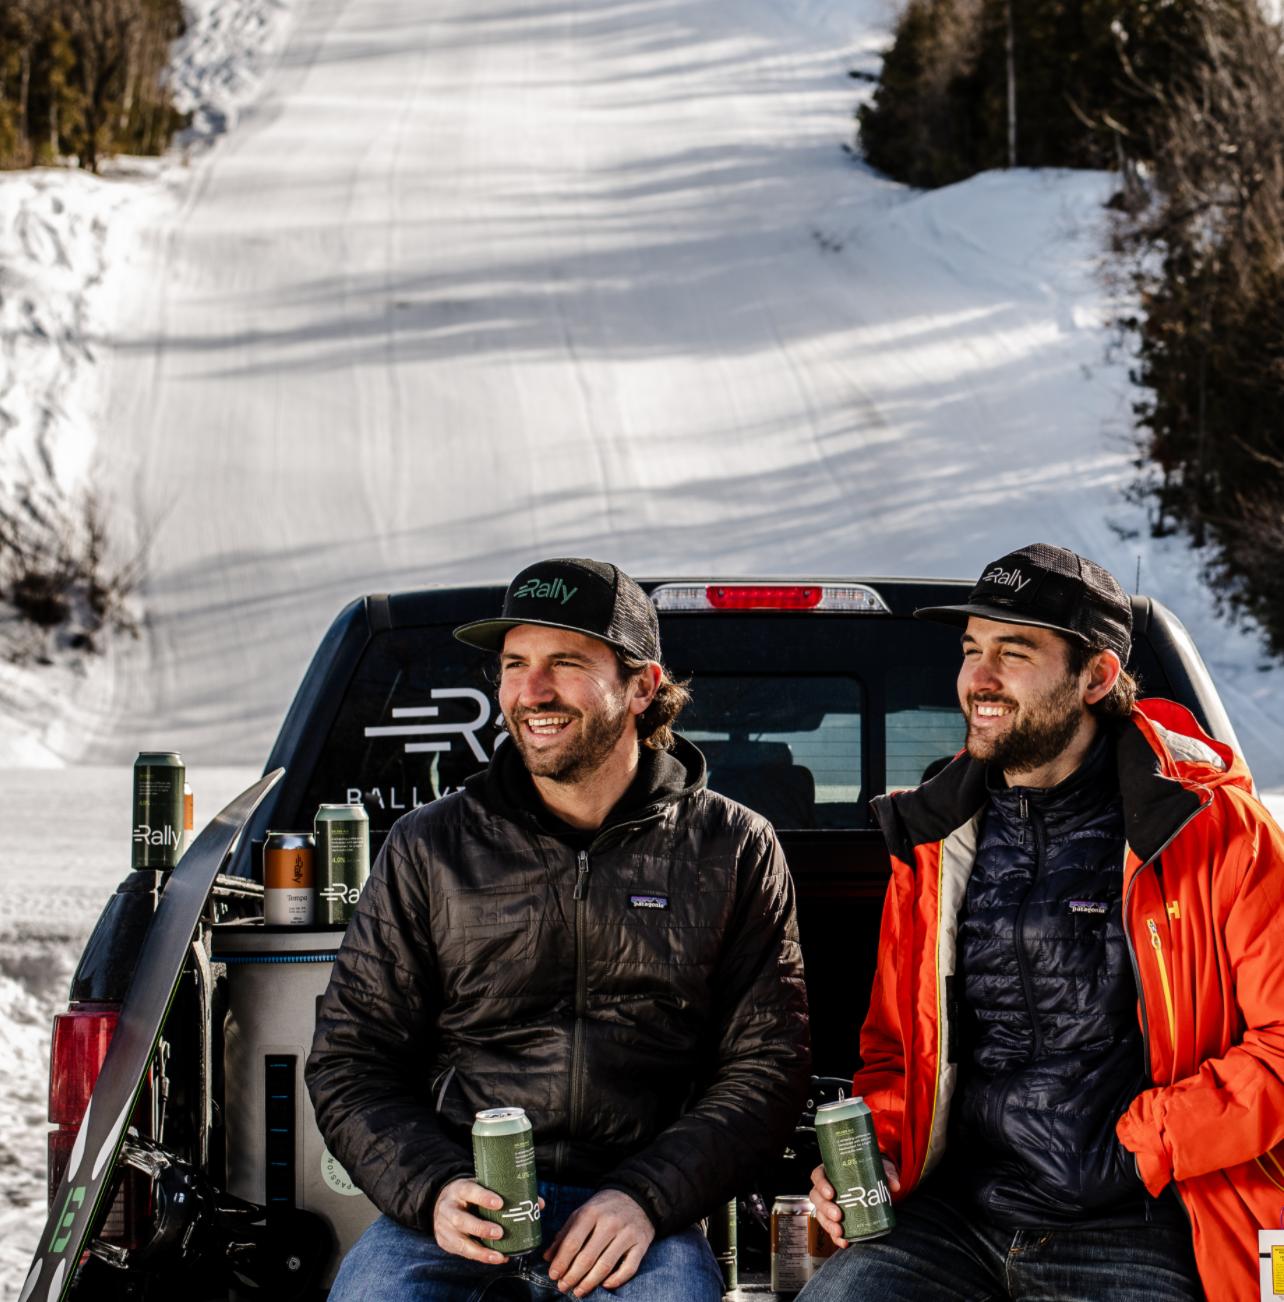 Rally Beer